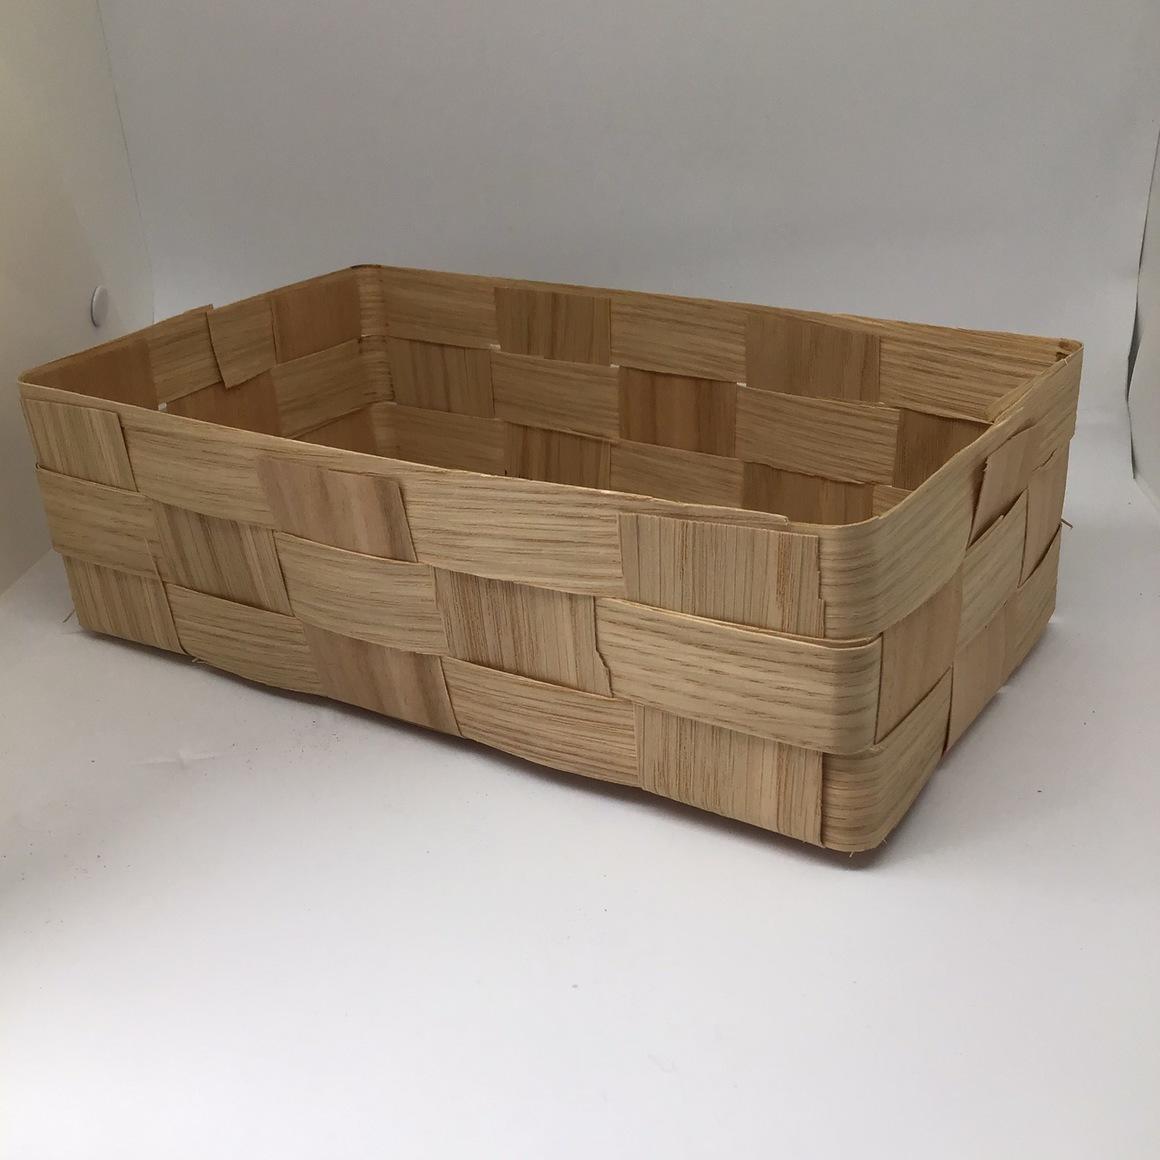 Large Hamper (16x26x9cm) Gift Box, Hamper, Packaging | Trada Marketplace